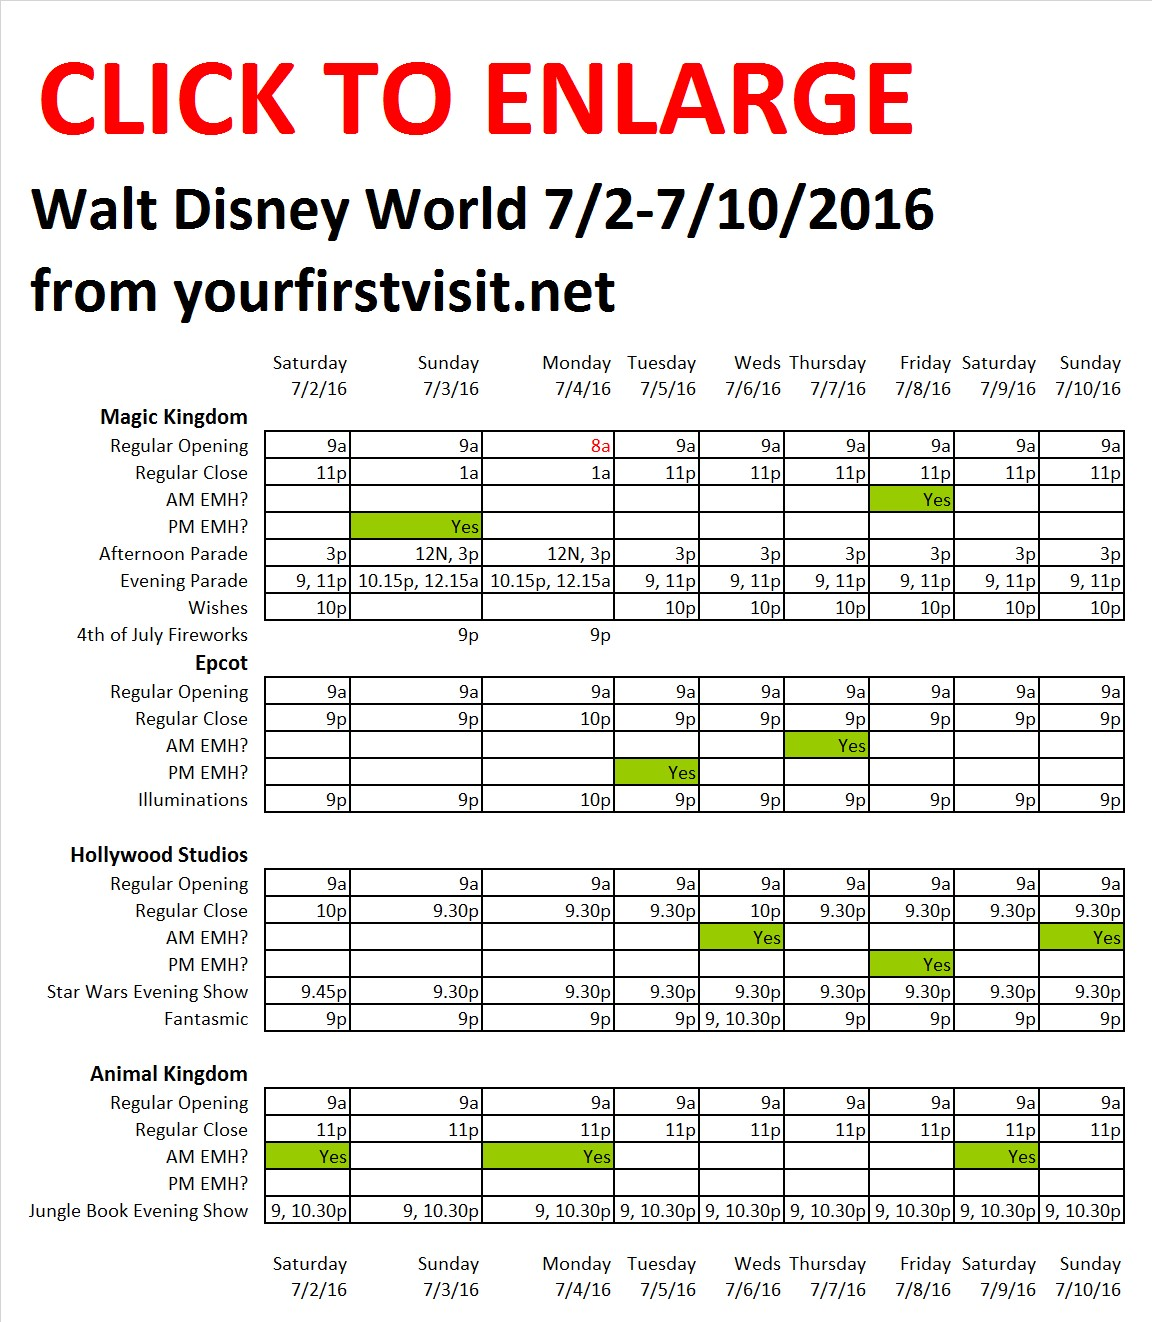 Disney World 7-2 to 7-10-2016 from yourfirstvisit.net